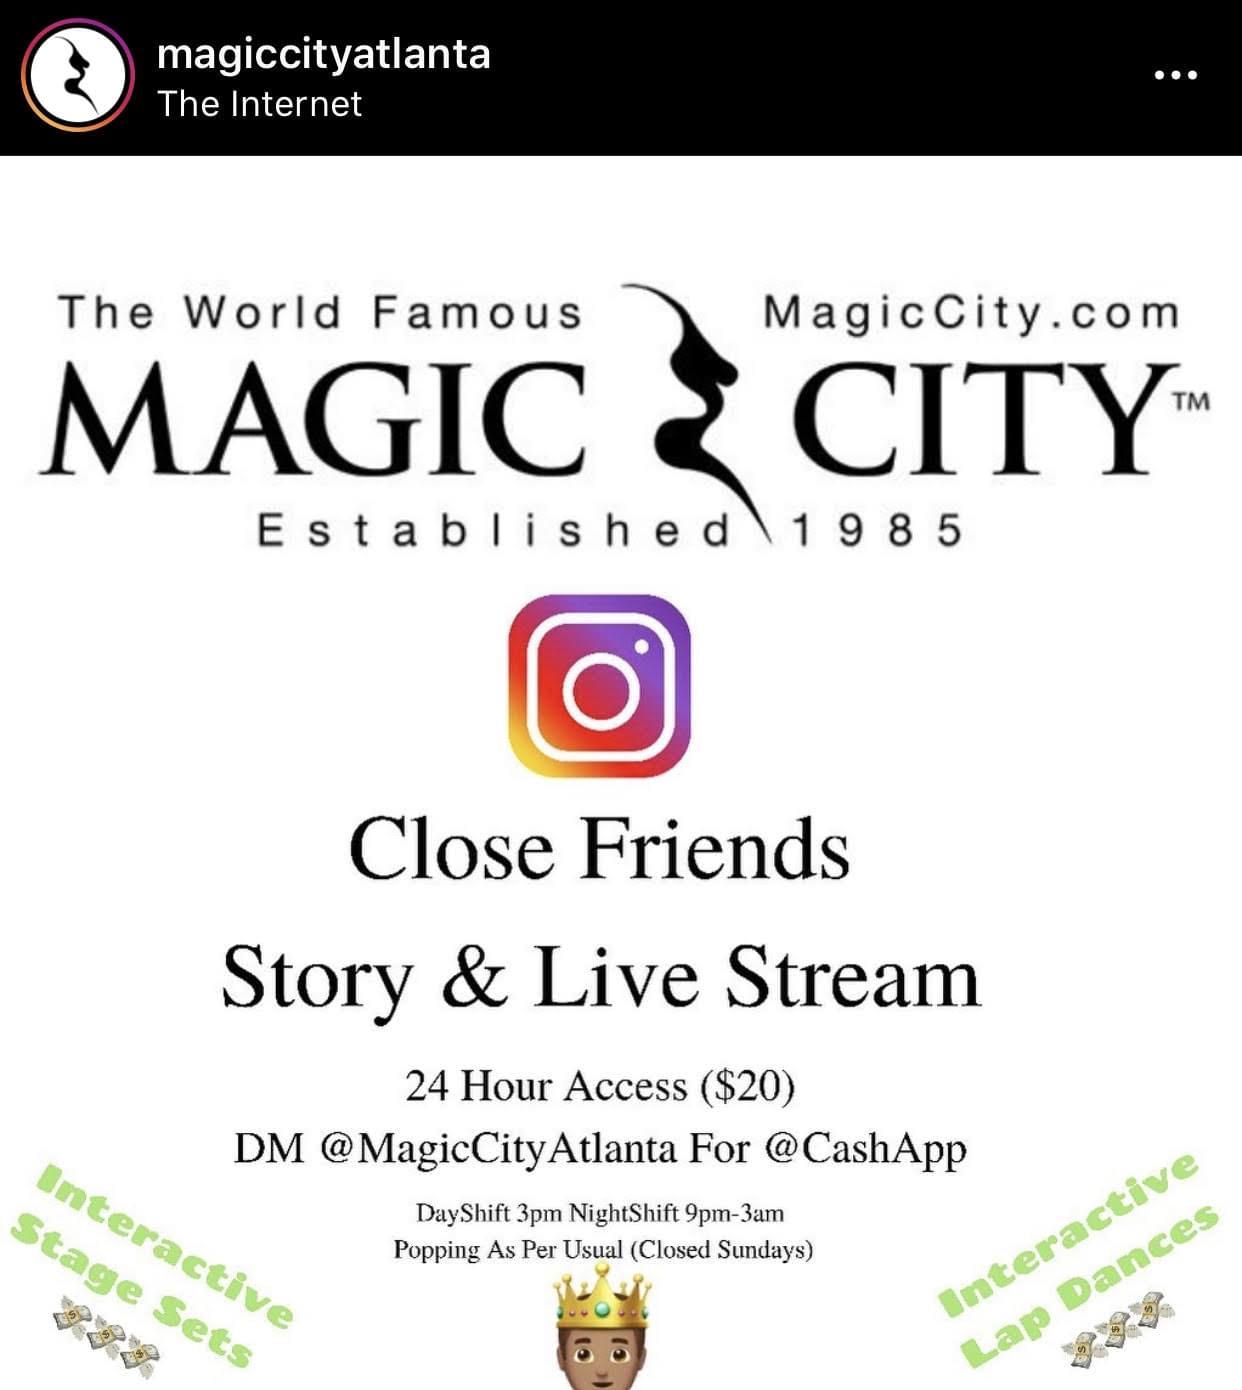 Magic City Offering 'Virtual Lap Dances'